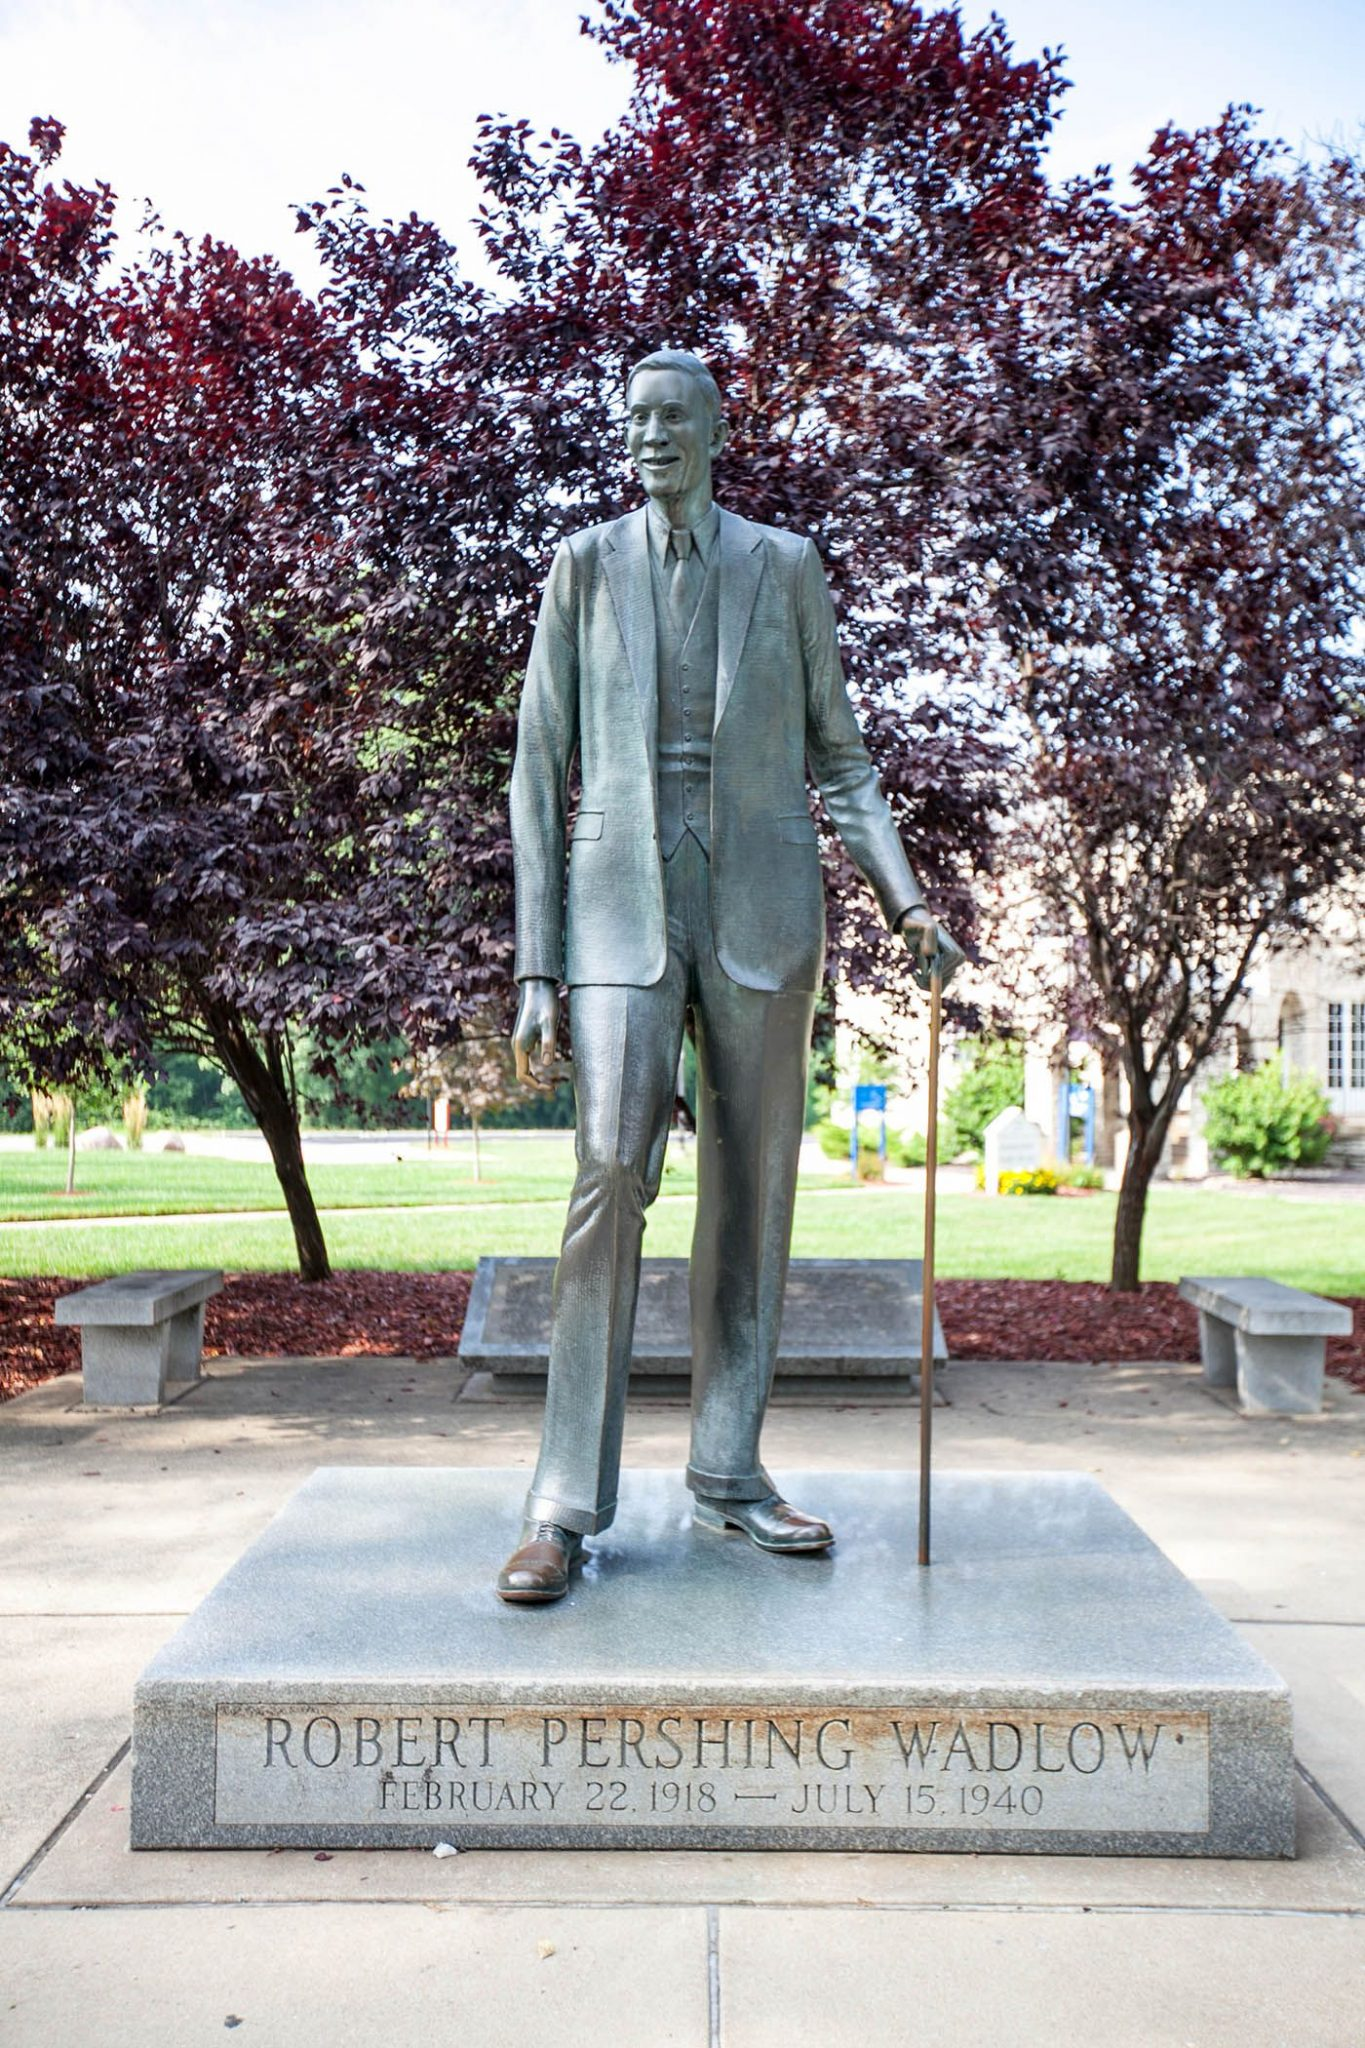 Patung Robert Wadlow